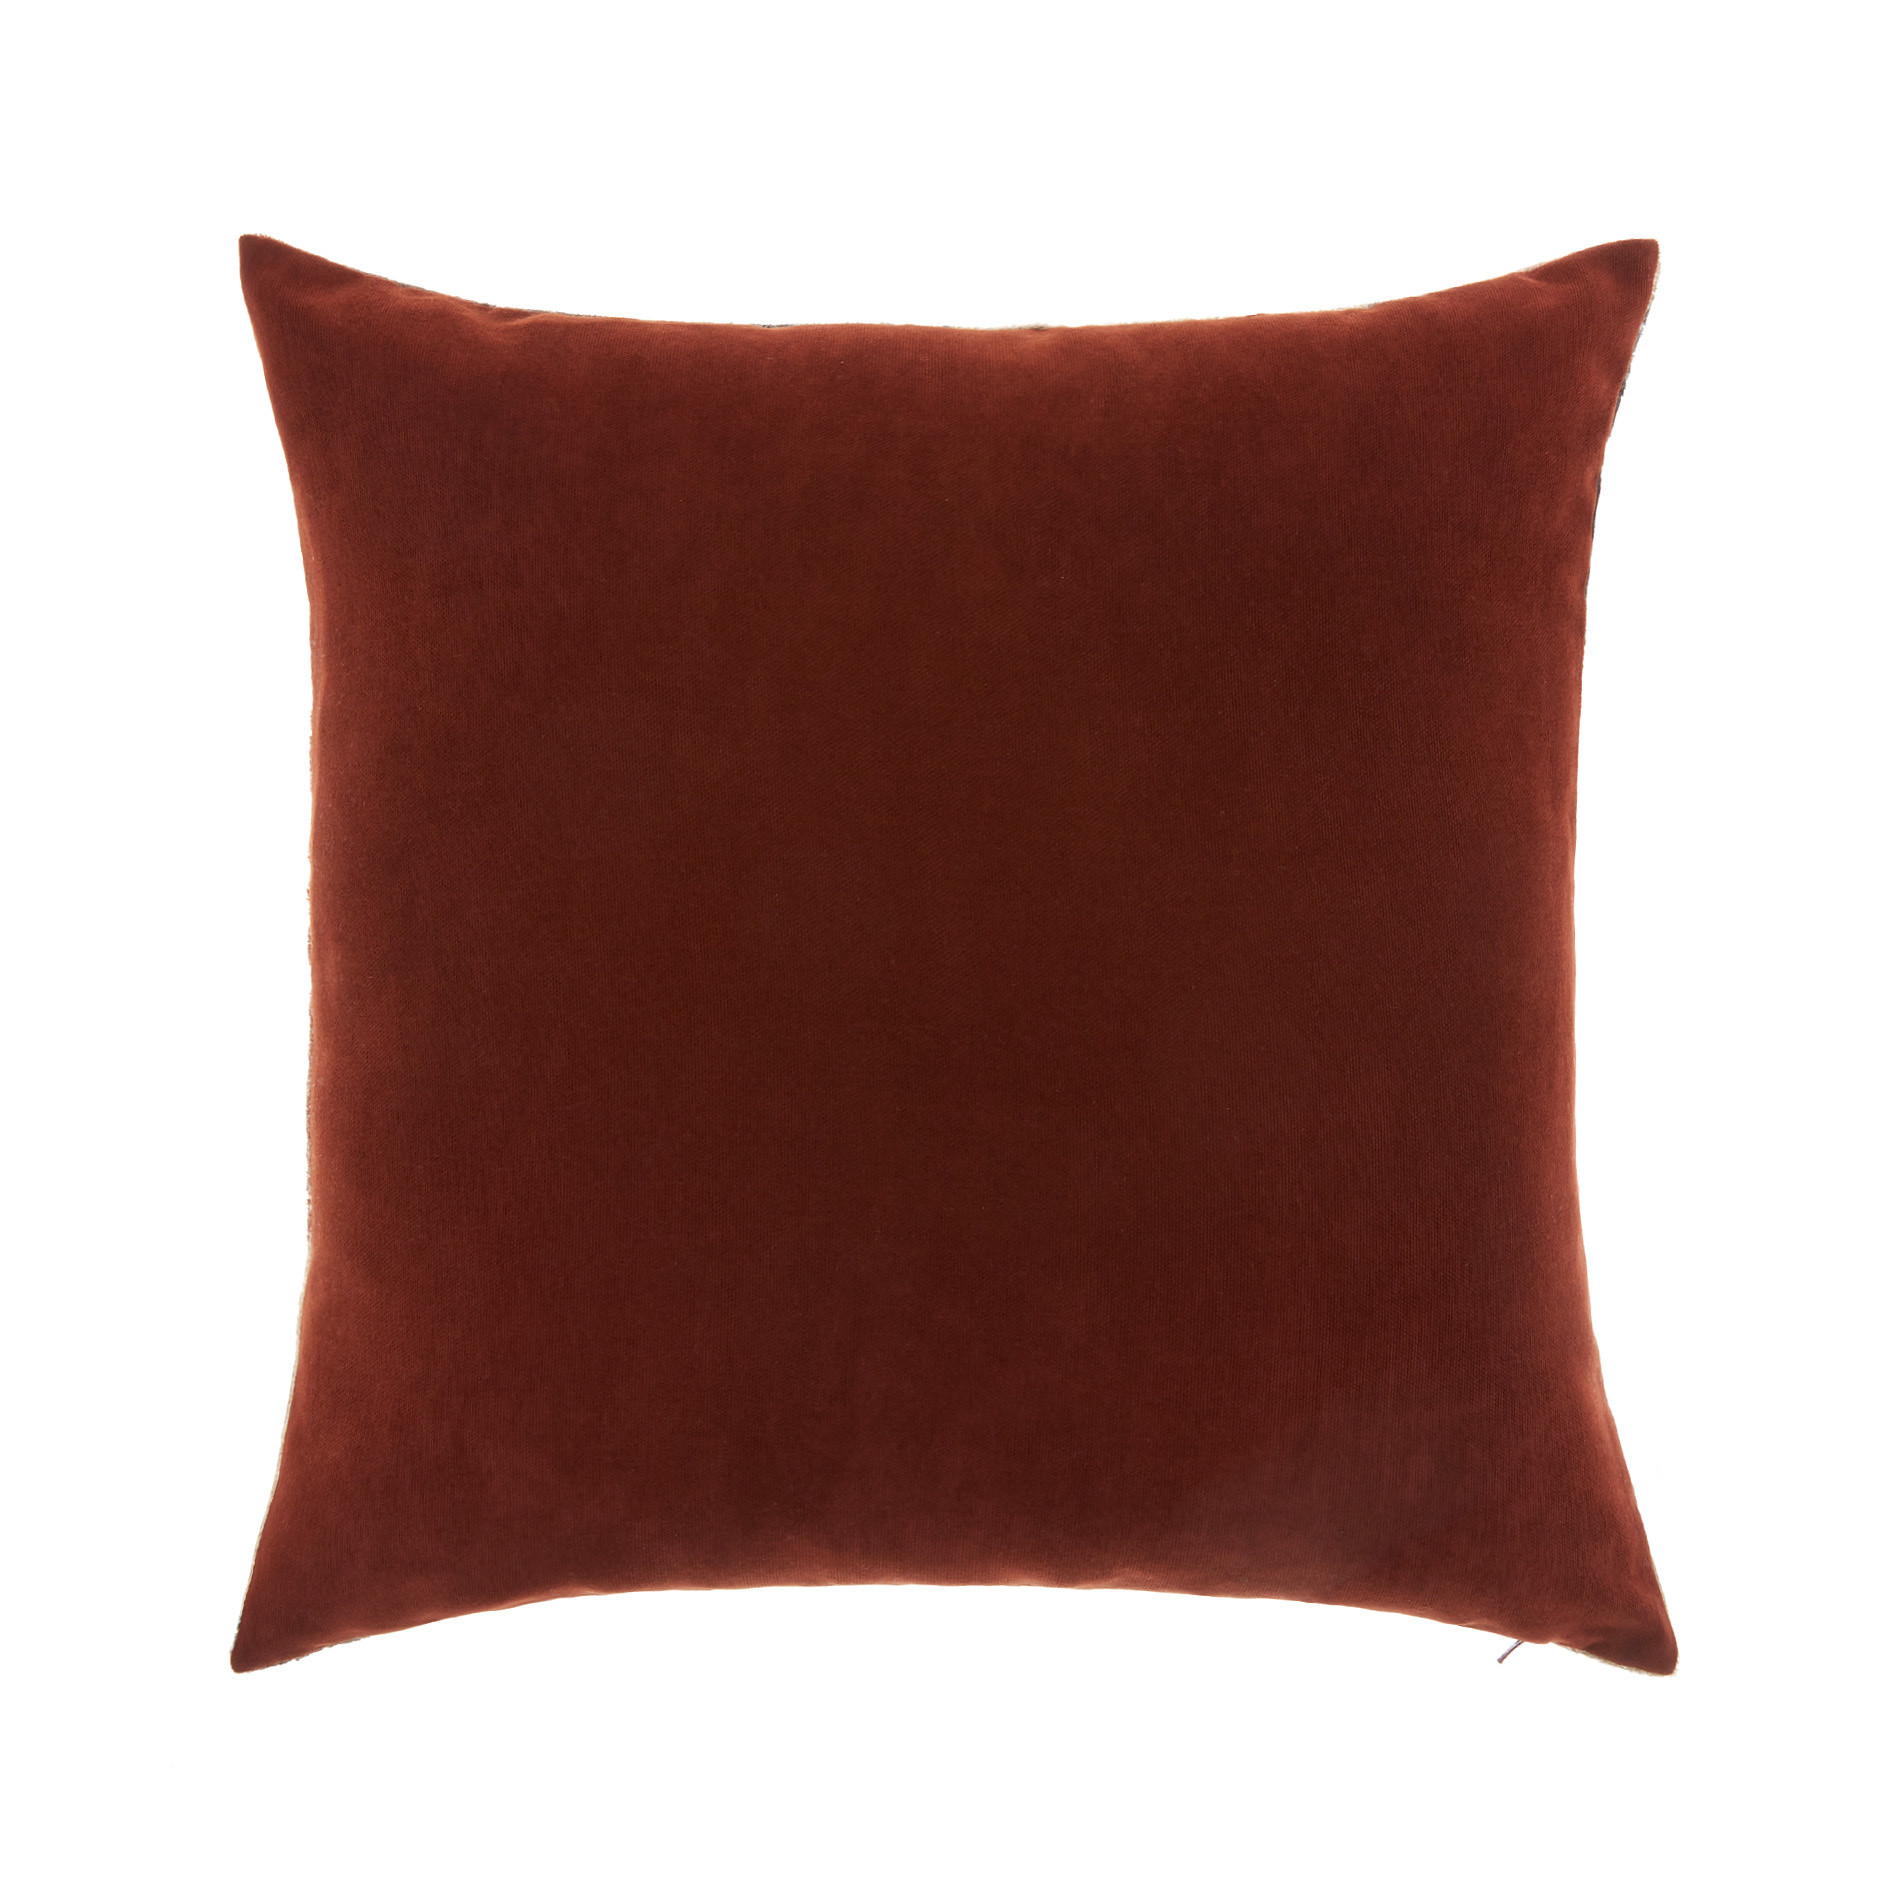 Cuscino velluto motivo geometrico 45x45cm, Marrone, large image number 1